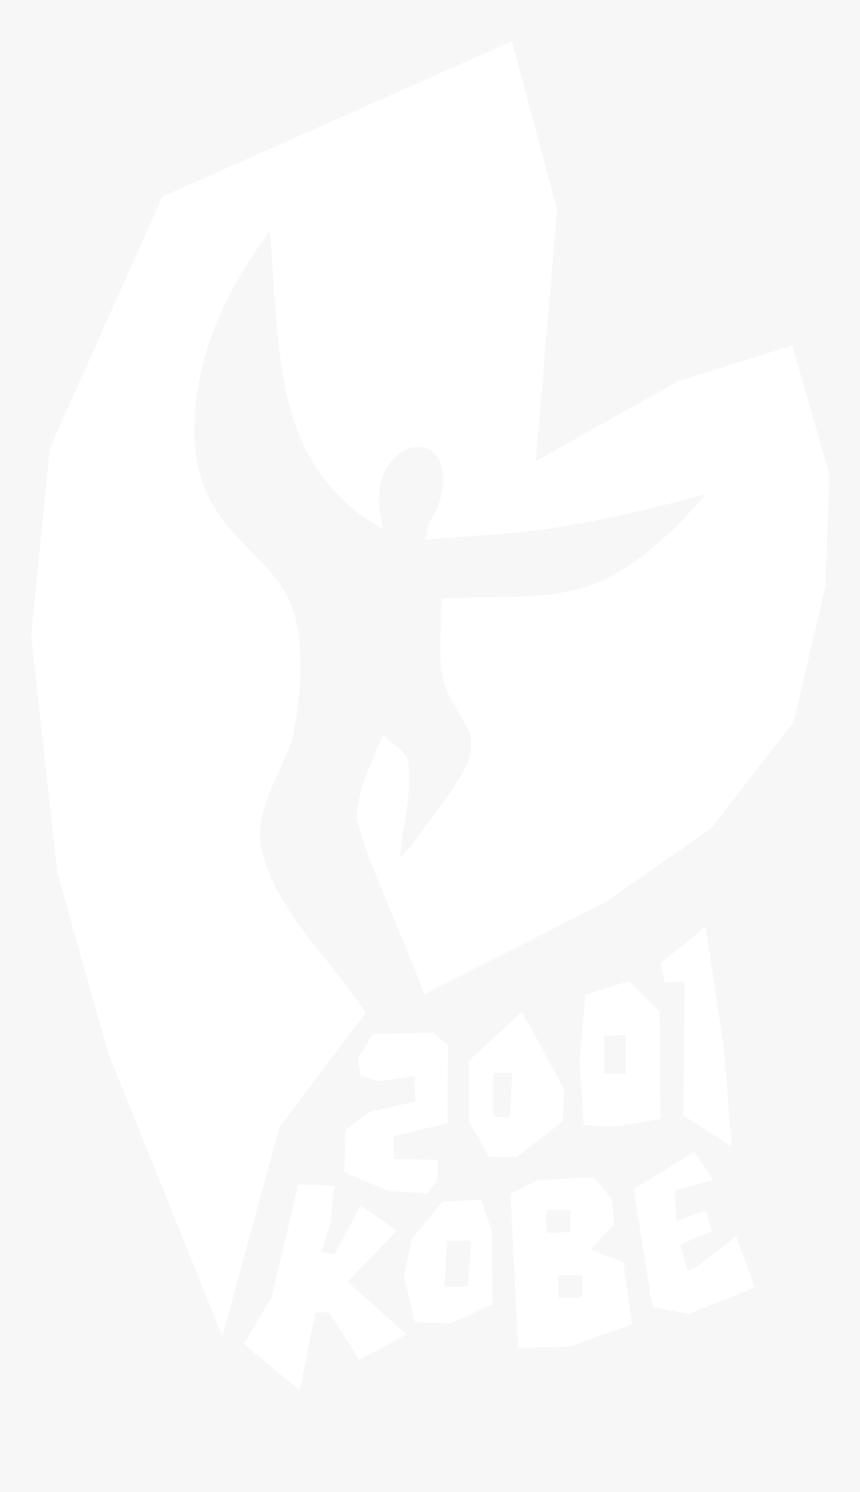 2001 Kobe Logo Black And White - Johns Hopkins Logo White, HD Png Download, Free Download